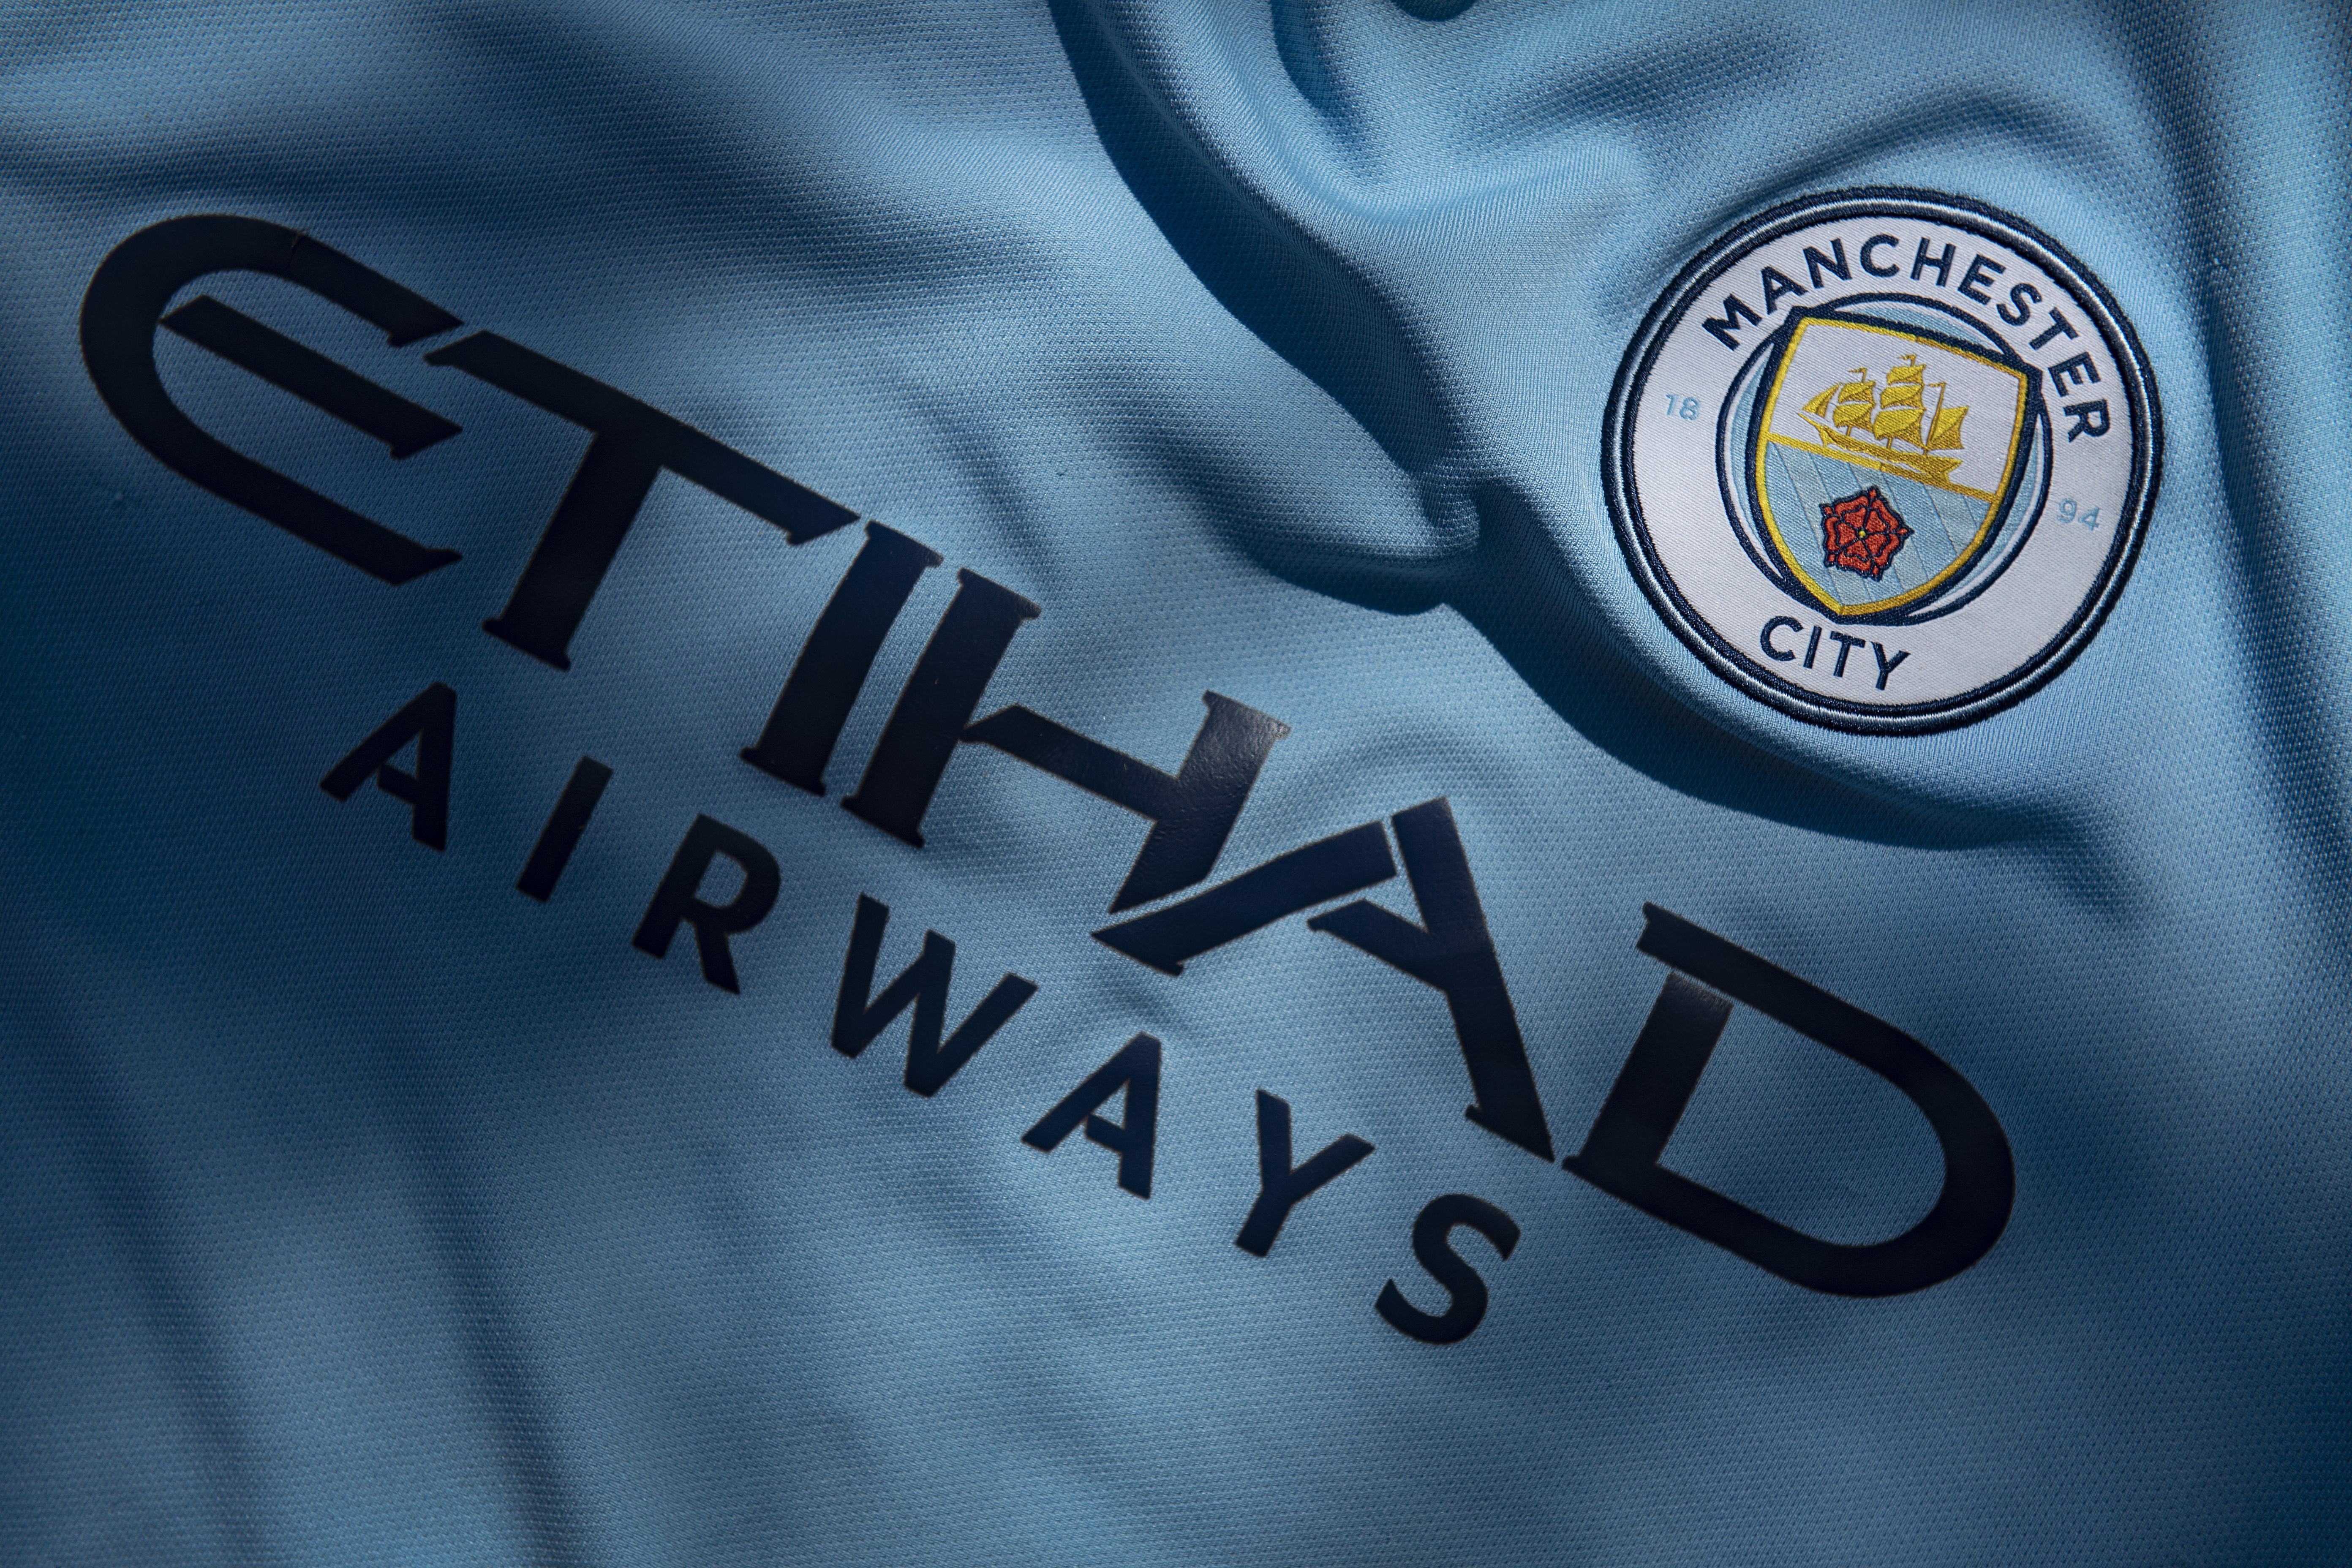 Manchester City Club Crest and Etihad Airways